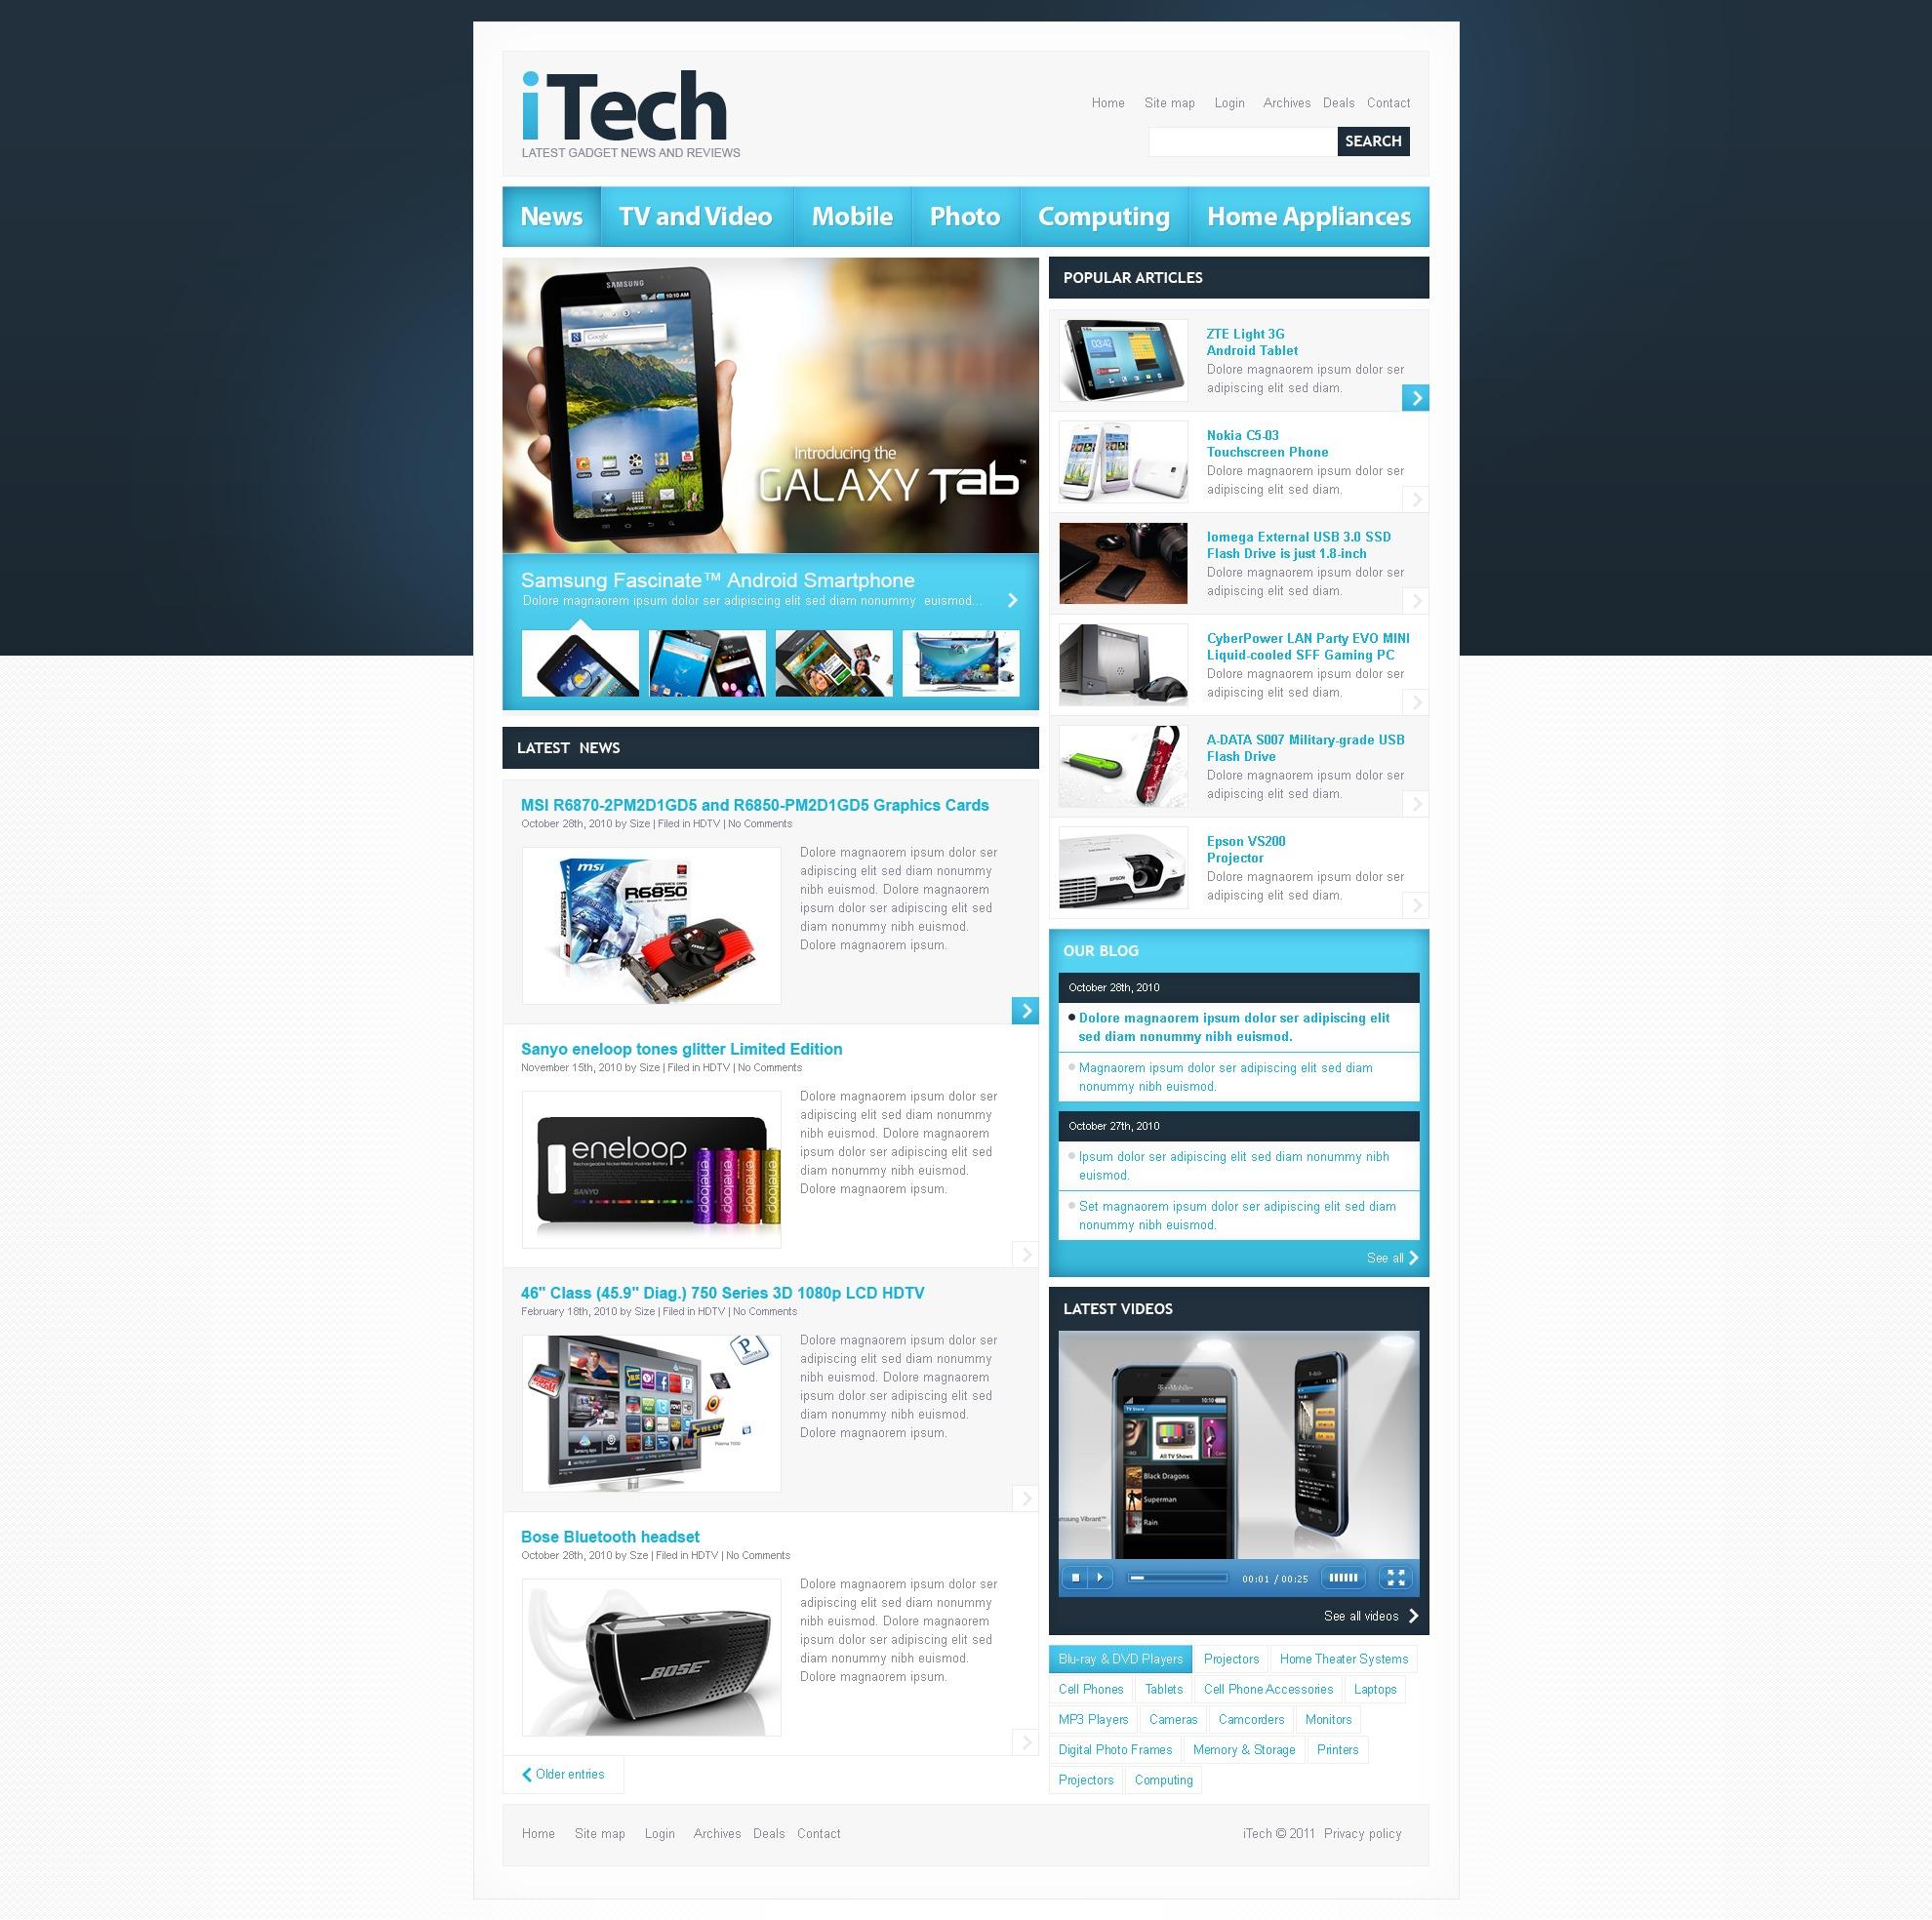 electronics review website template 32353. Black Bedroom Furniture Sets. Home Design Ideas